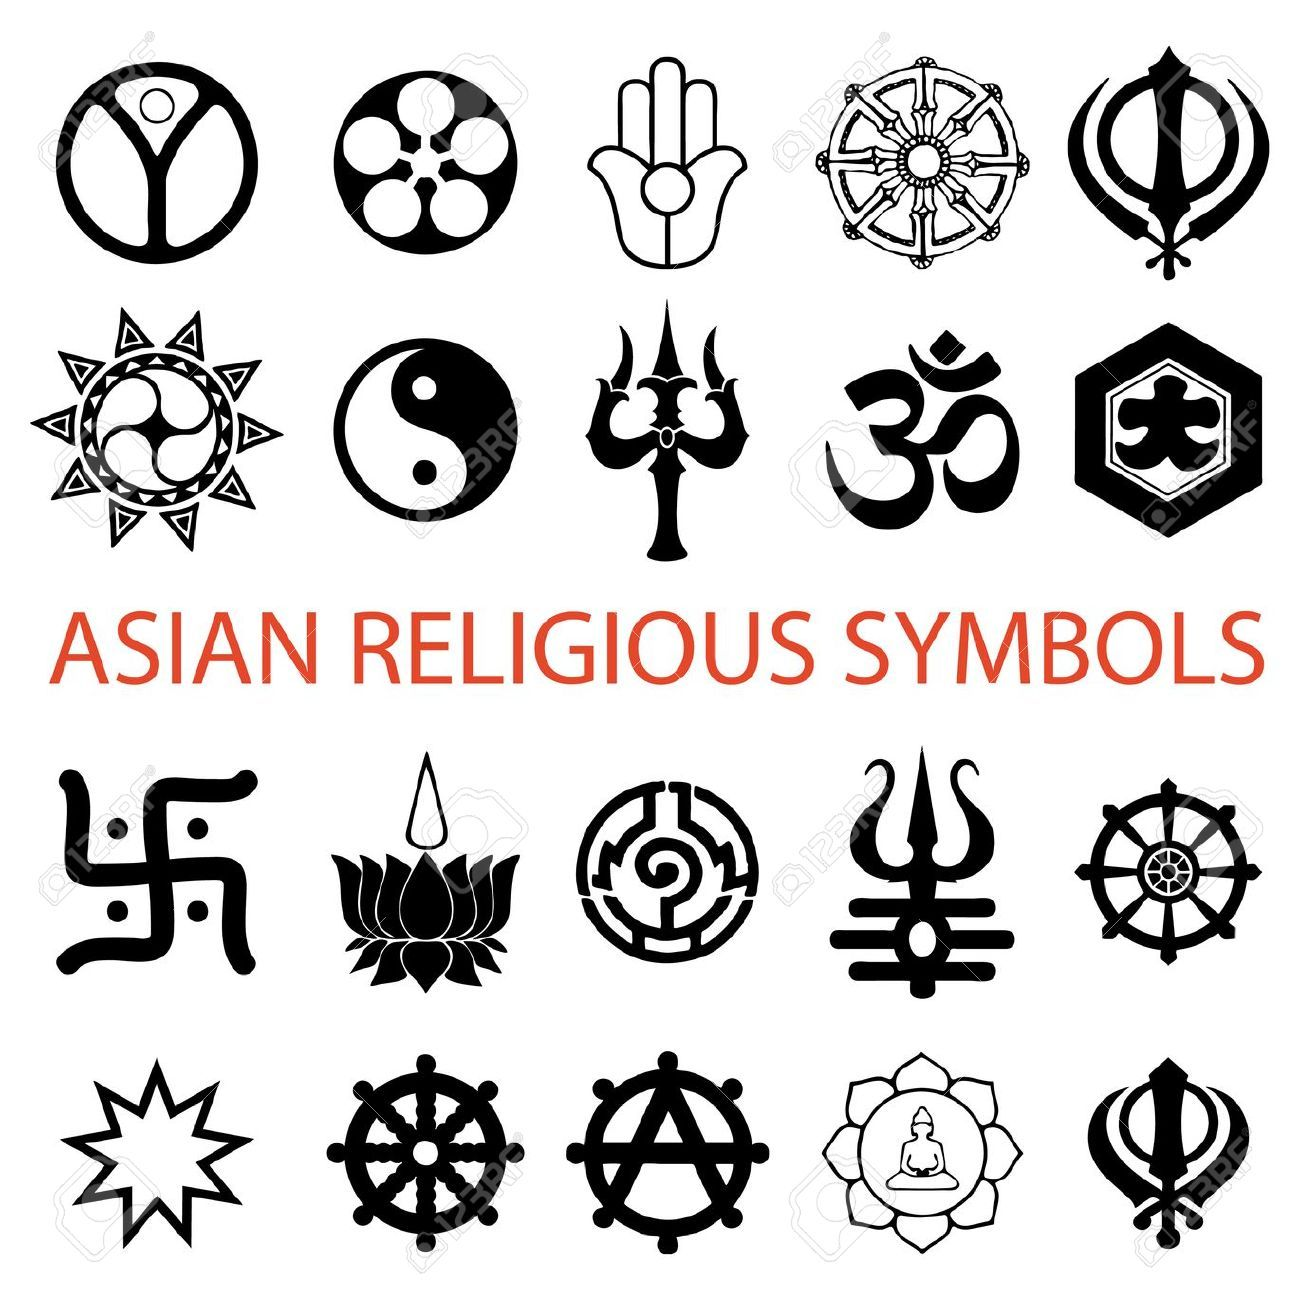 Various Religious Symbols Art Pinterest Religious Symbols And